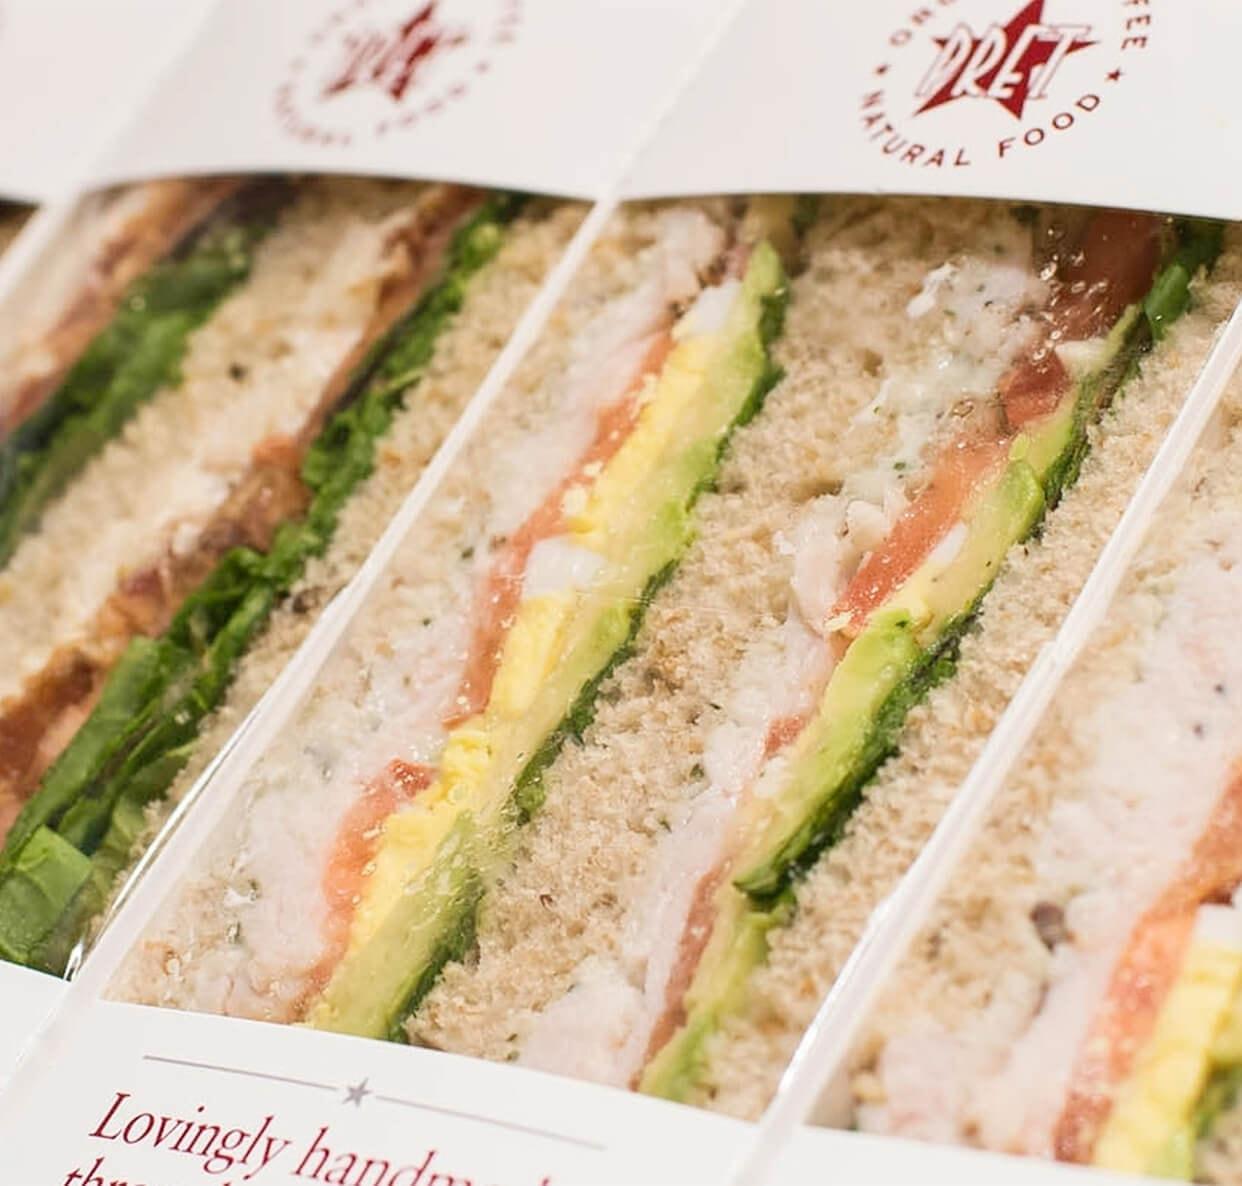 Pret Scottish smoked salmon sandwiches